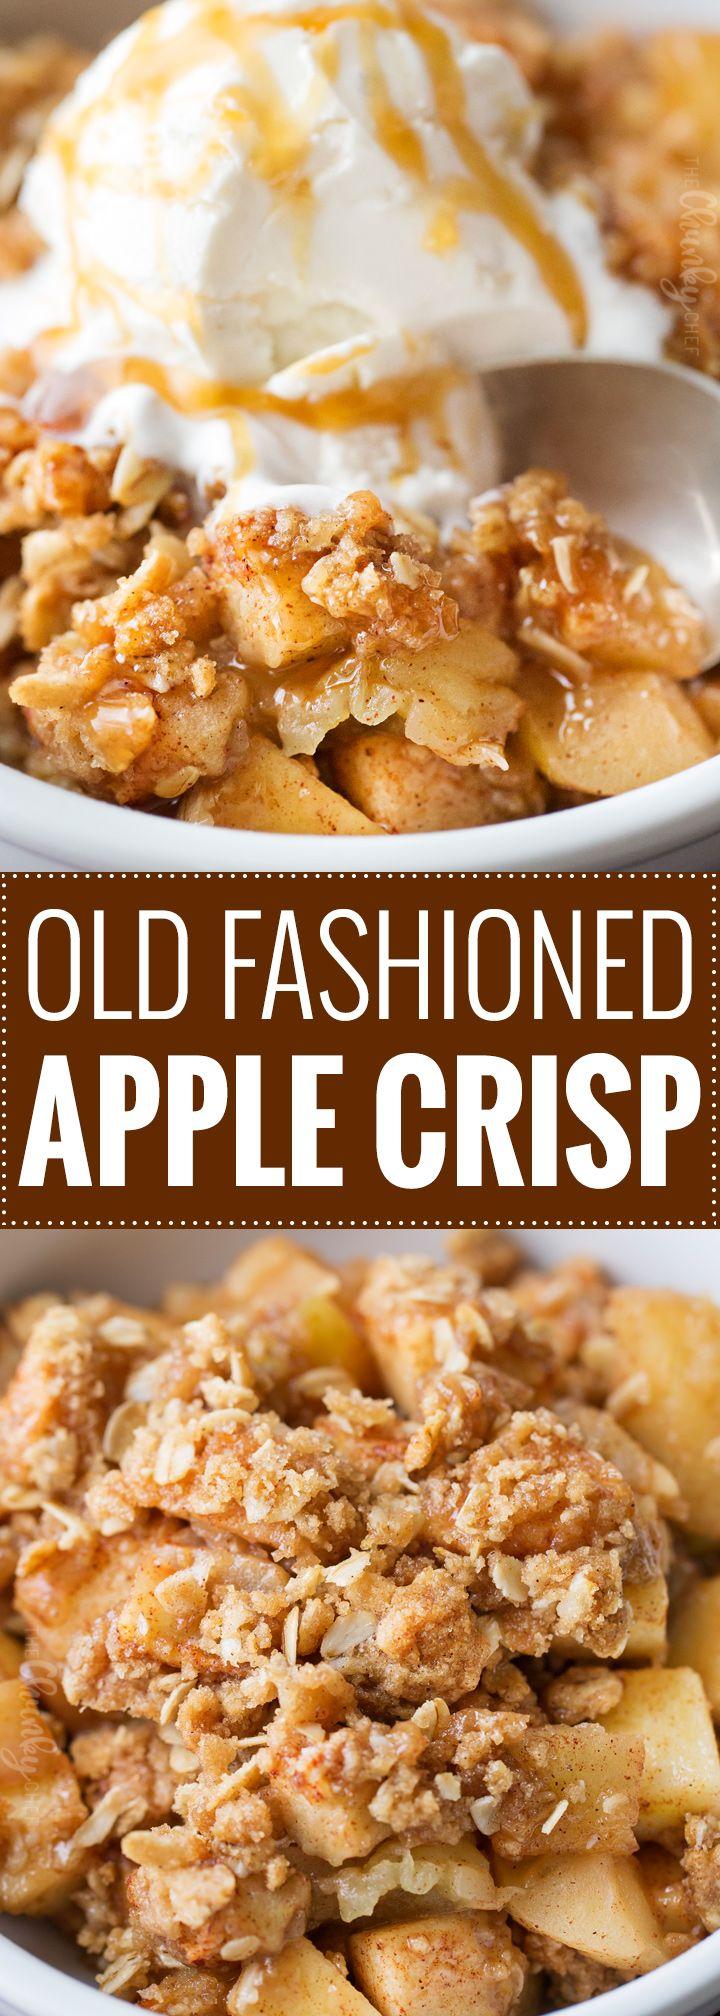 Old Fashioned Easy Apple Crisp Chopped apples, cinnamon